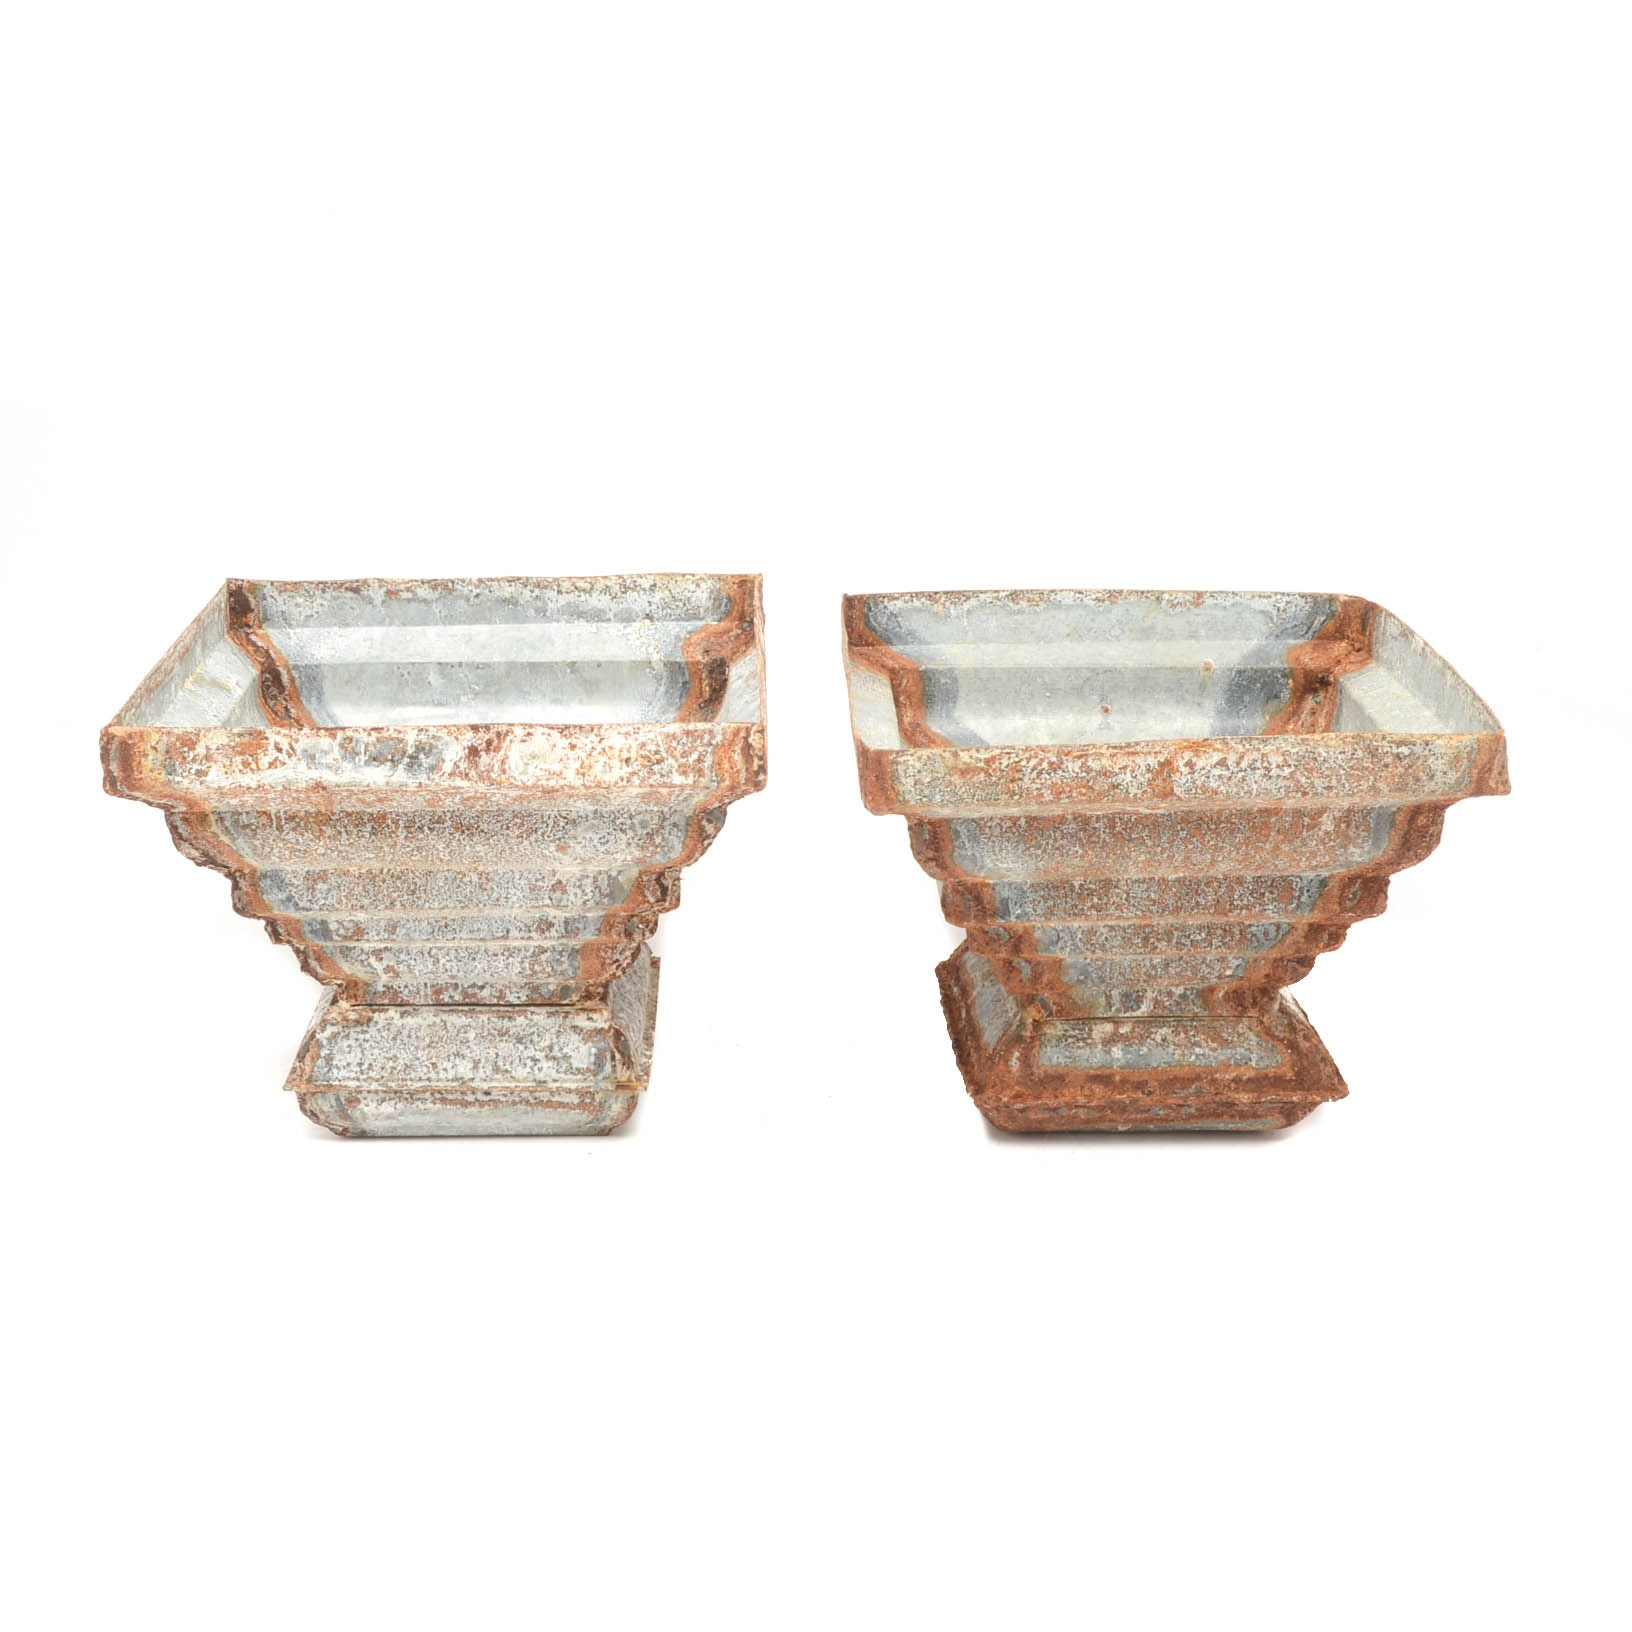 Rustic Square Zinc Risers